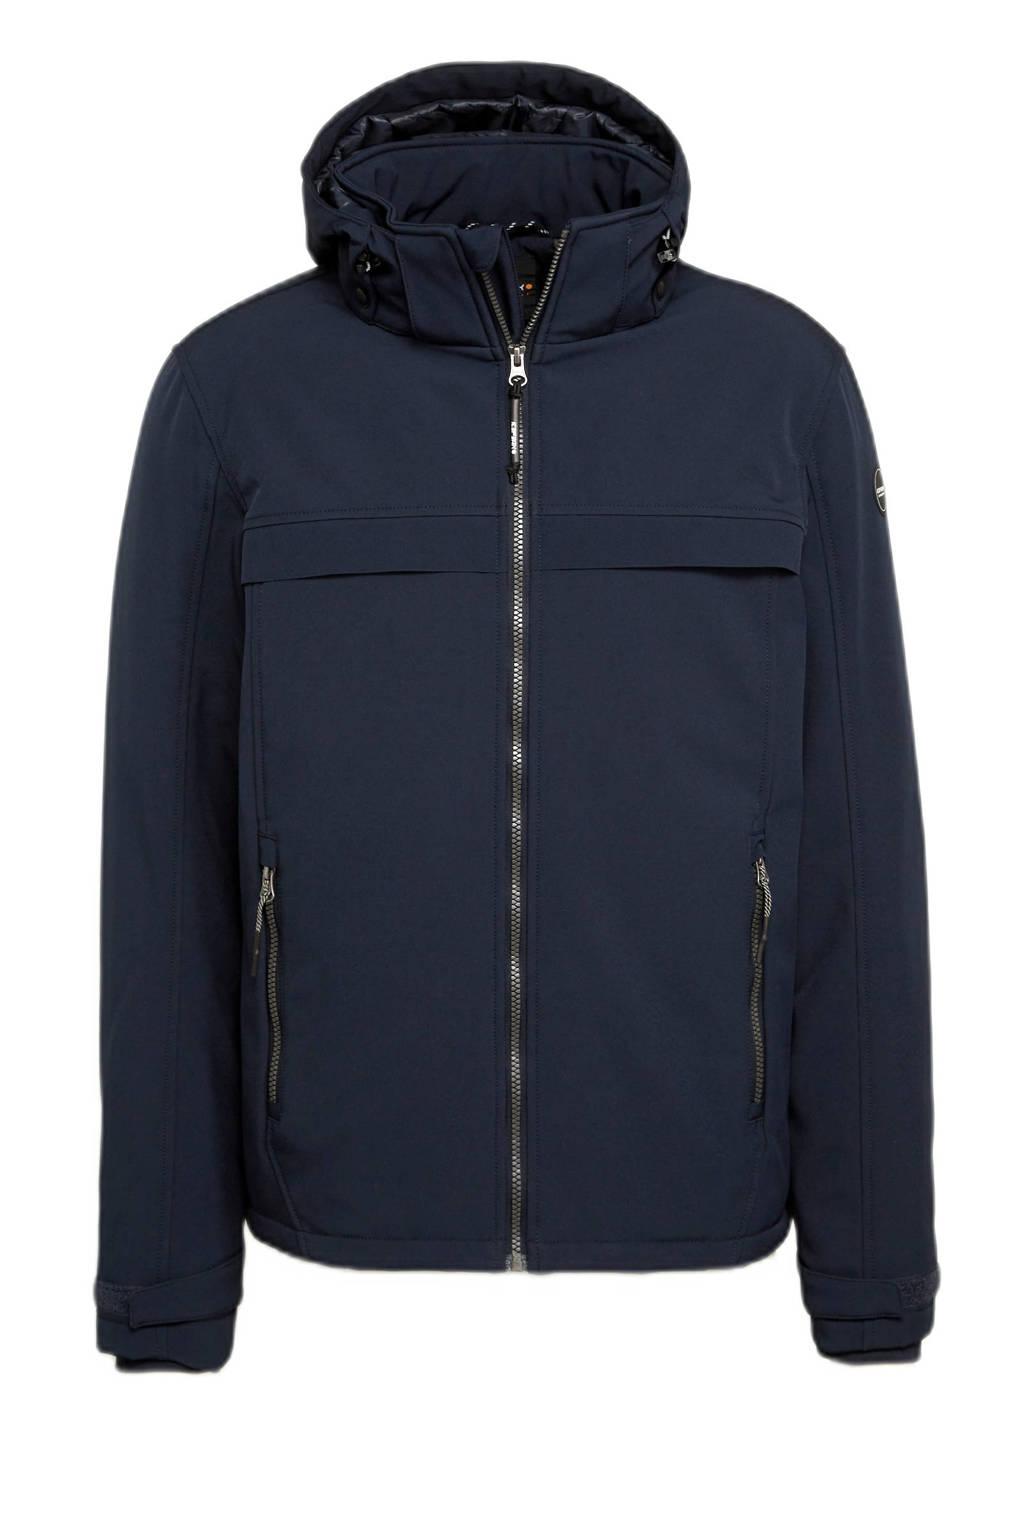 Icepeak  gewatteerde softshell jas Aub donkerblauw, Donkerblauw